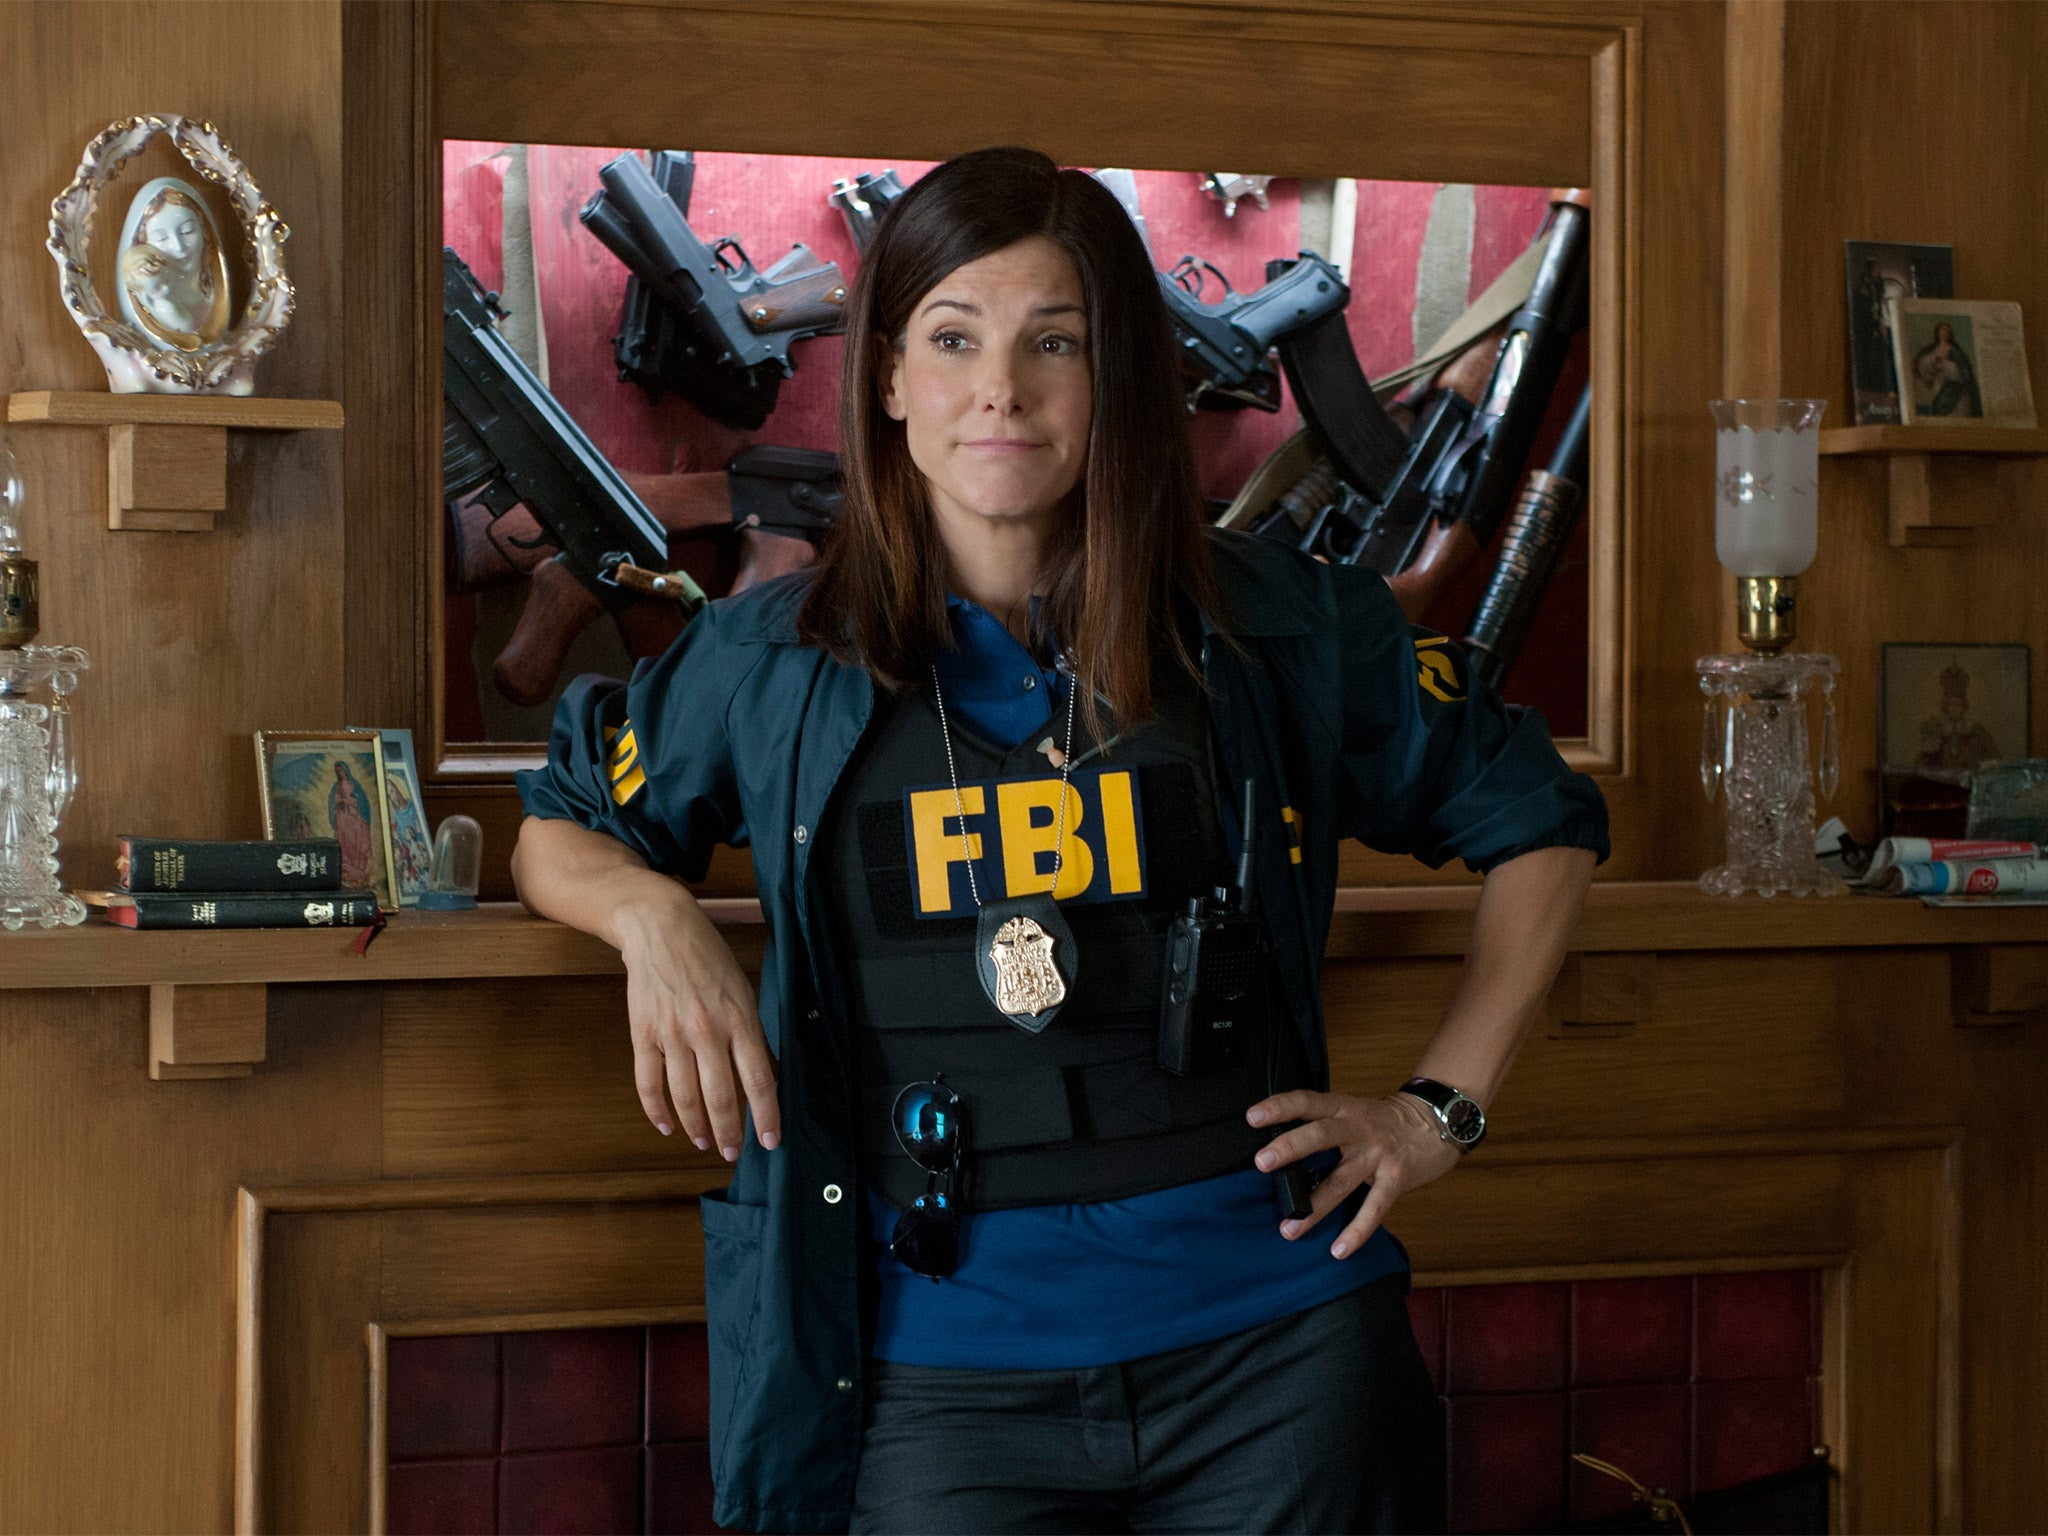 Fbi agents dating